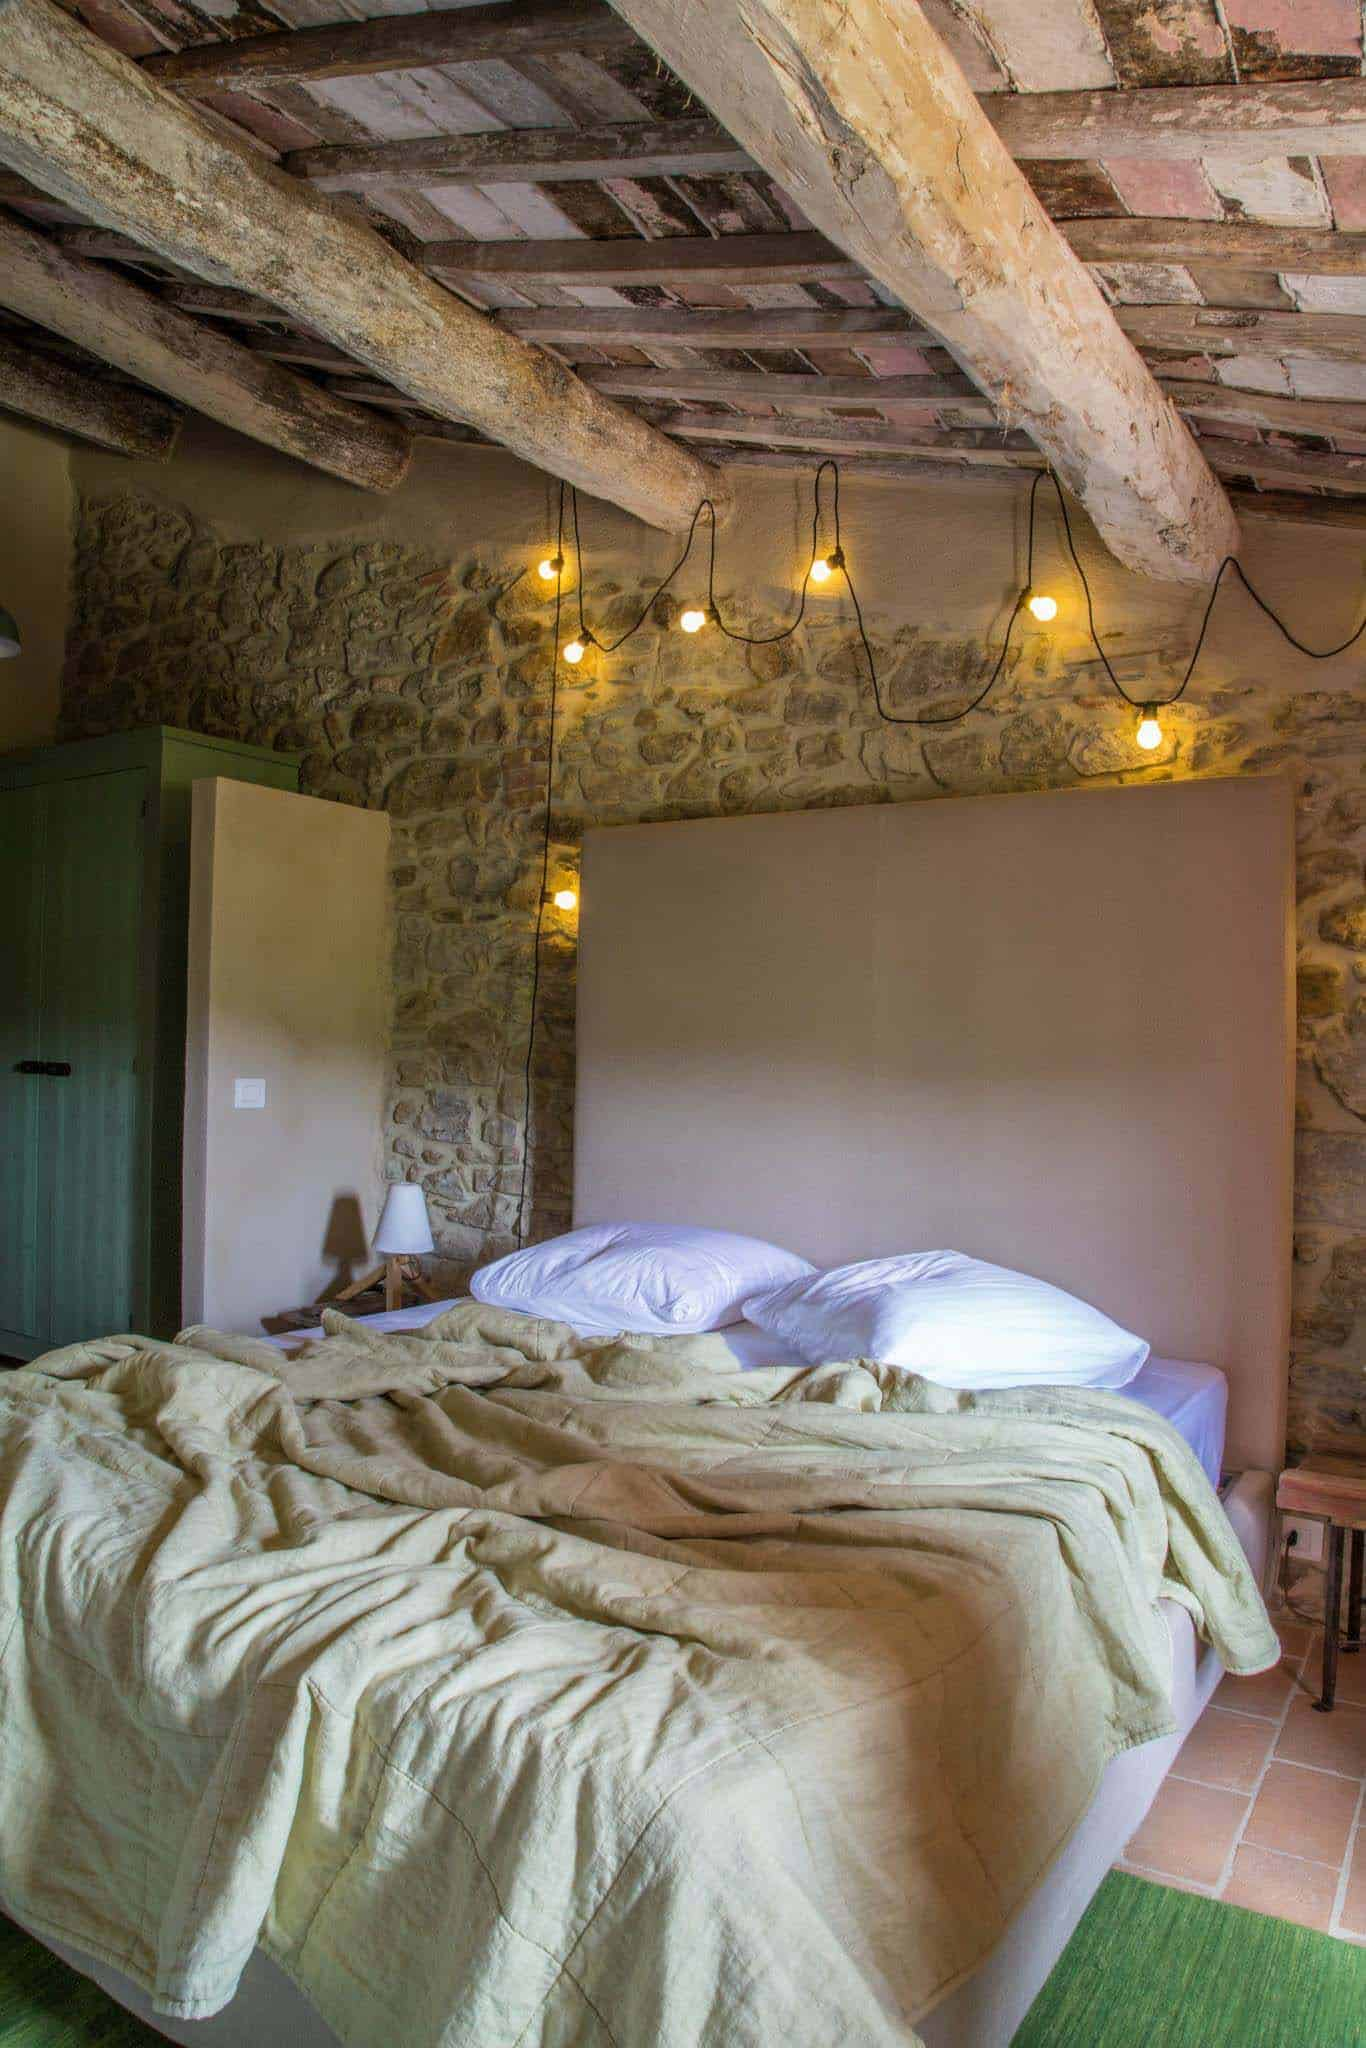 Historic Farmhouse Renovation-Special Umbria-22-1 Kindesign